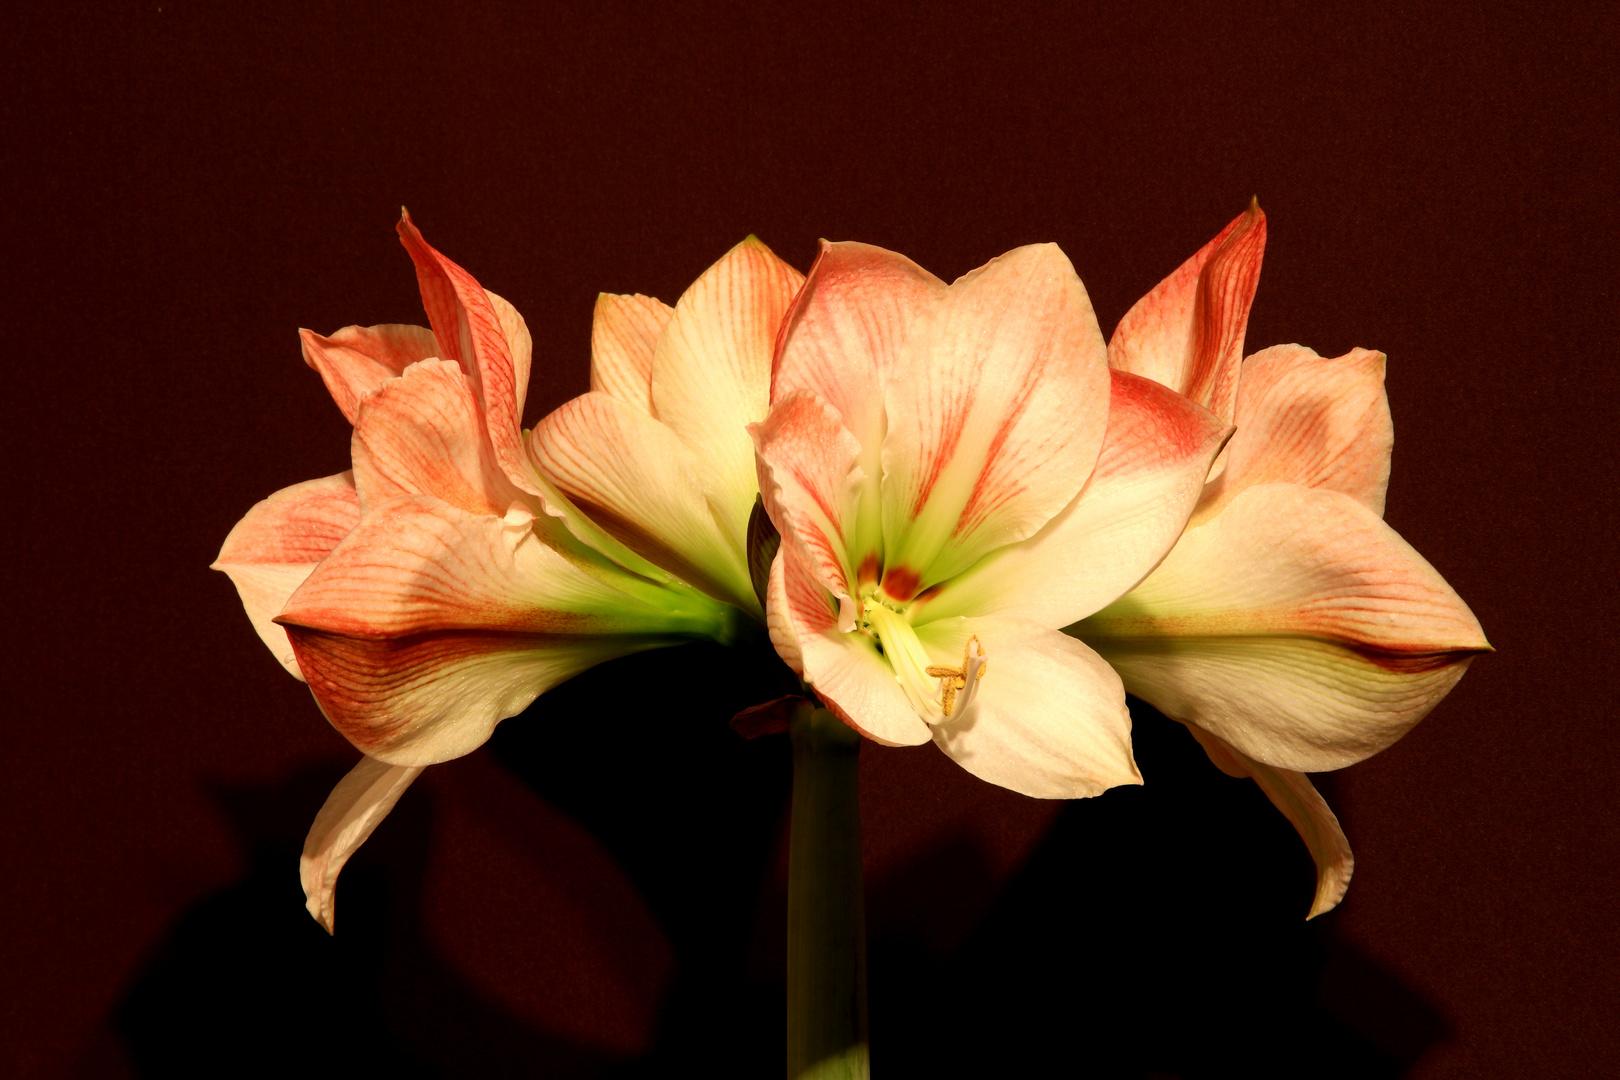 Amaryllis weis-rosa 1